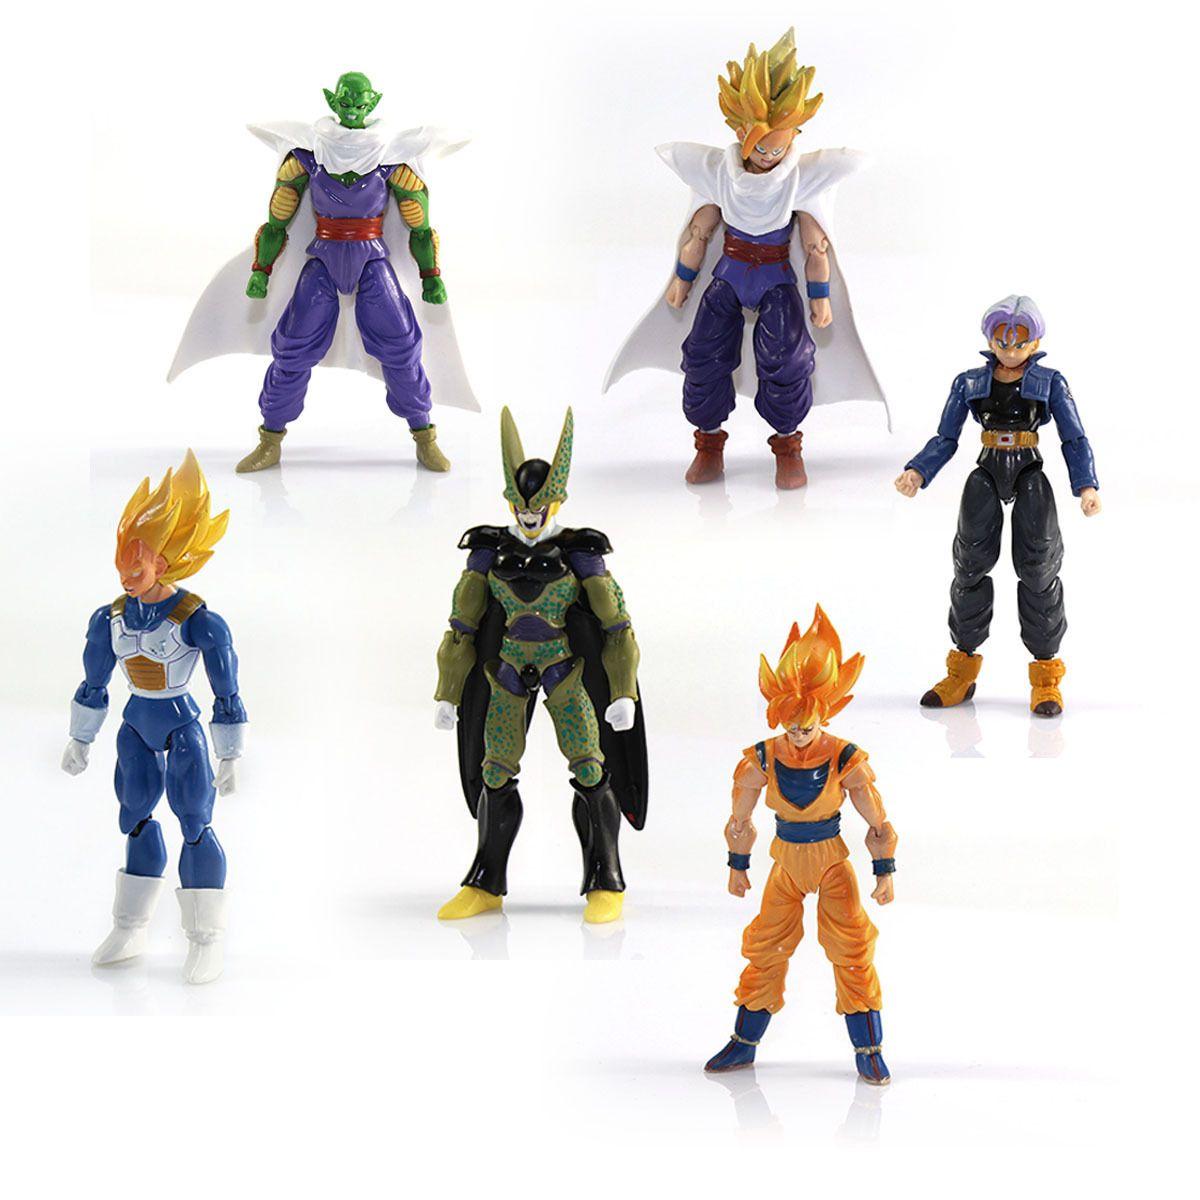 6pcs Anime Dragonball Z Dragon ball DBZ Goku Piccolo Action Figure Toy Set NEW